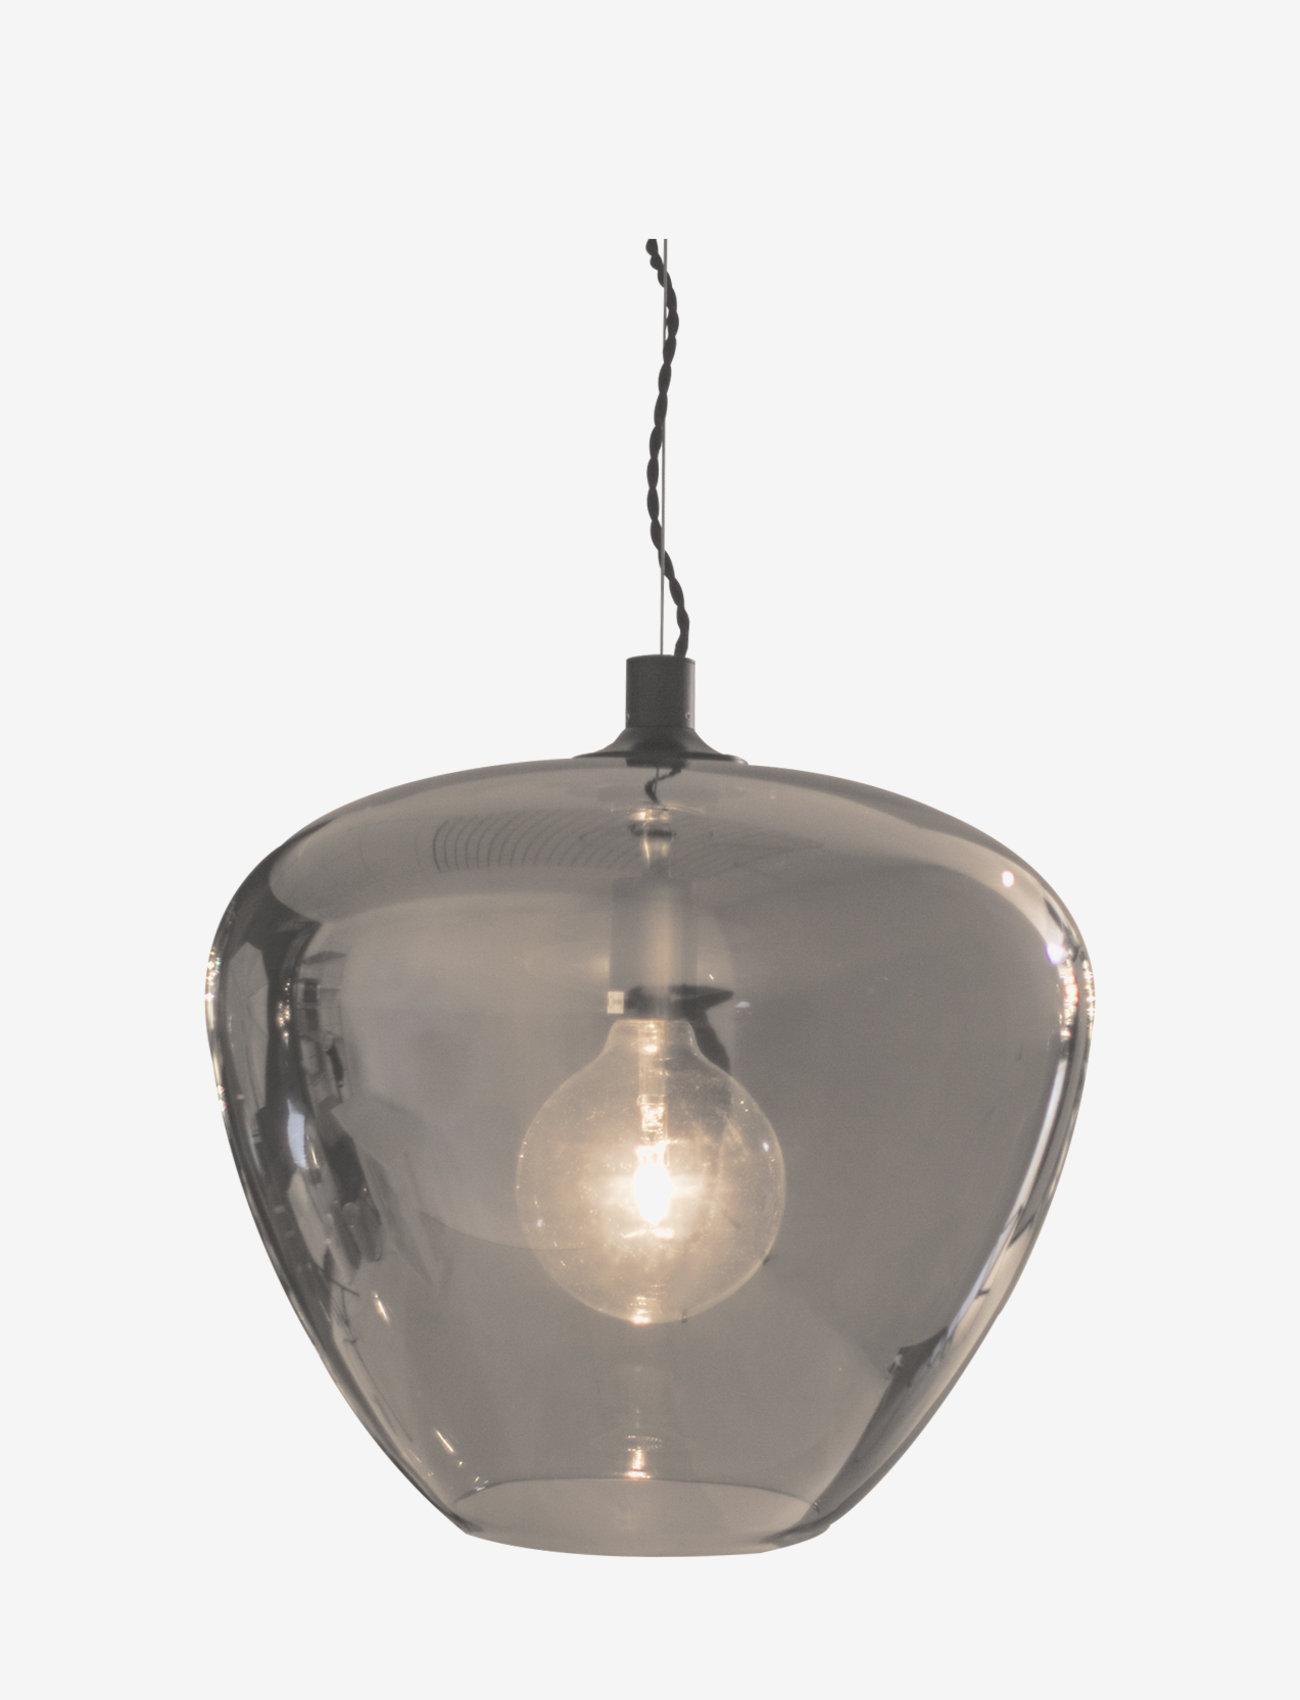 By Rydéns - Bellissimo Grande Hanginglamp - pendler - smoke grey - 0